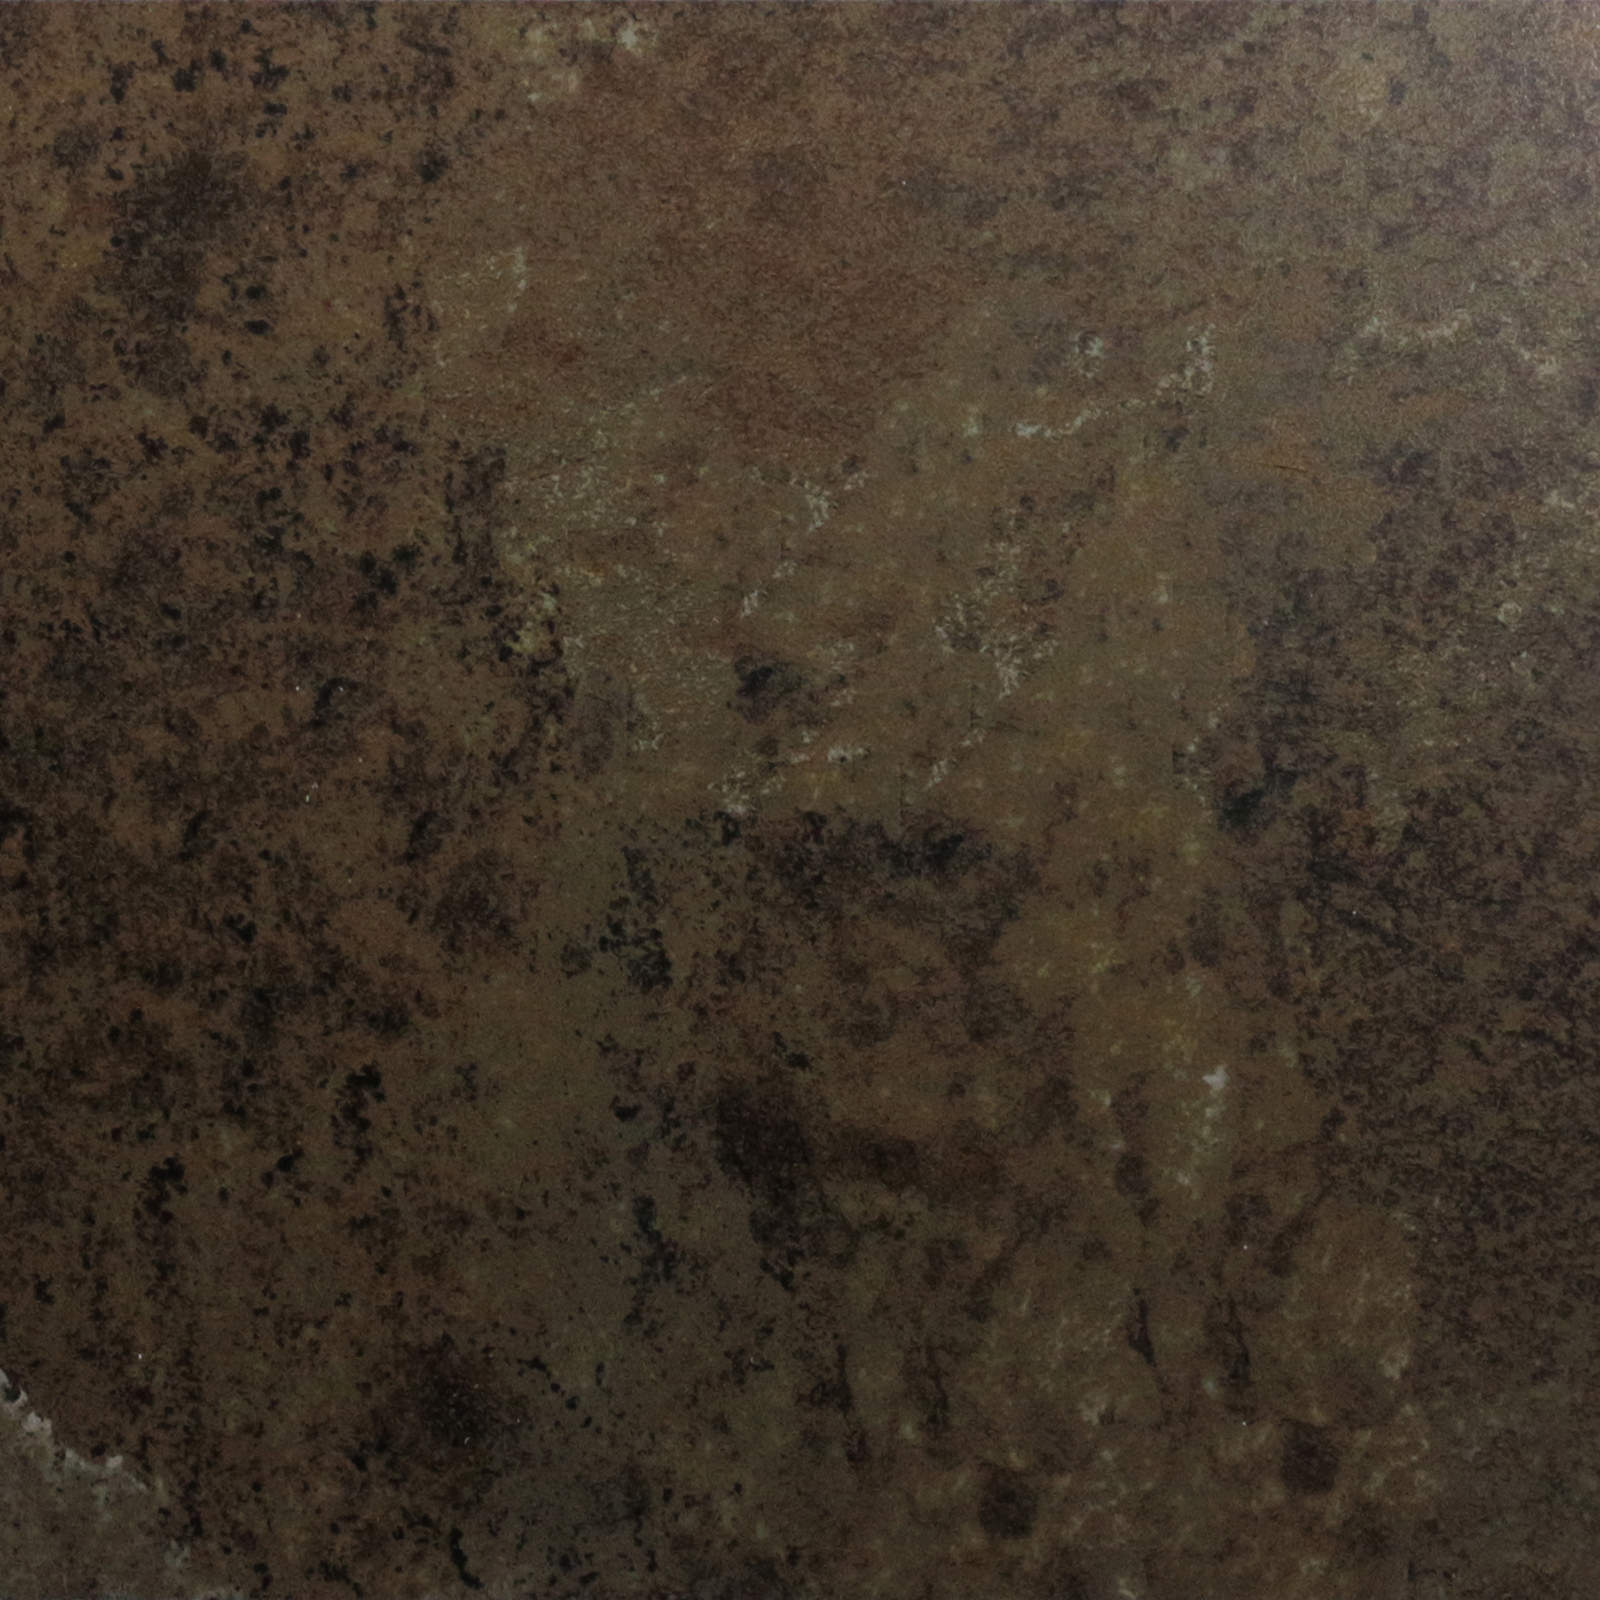 ariostea metal 100x100 cm brown zinc umt6s100500. Black Bedroom Furniture Sets. Home Design Ideas